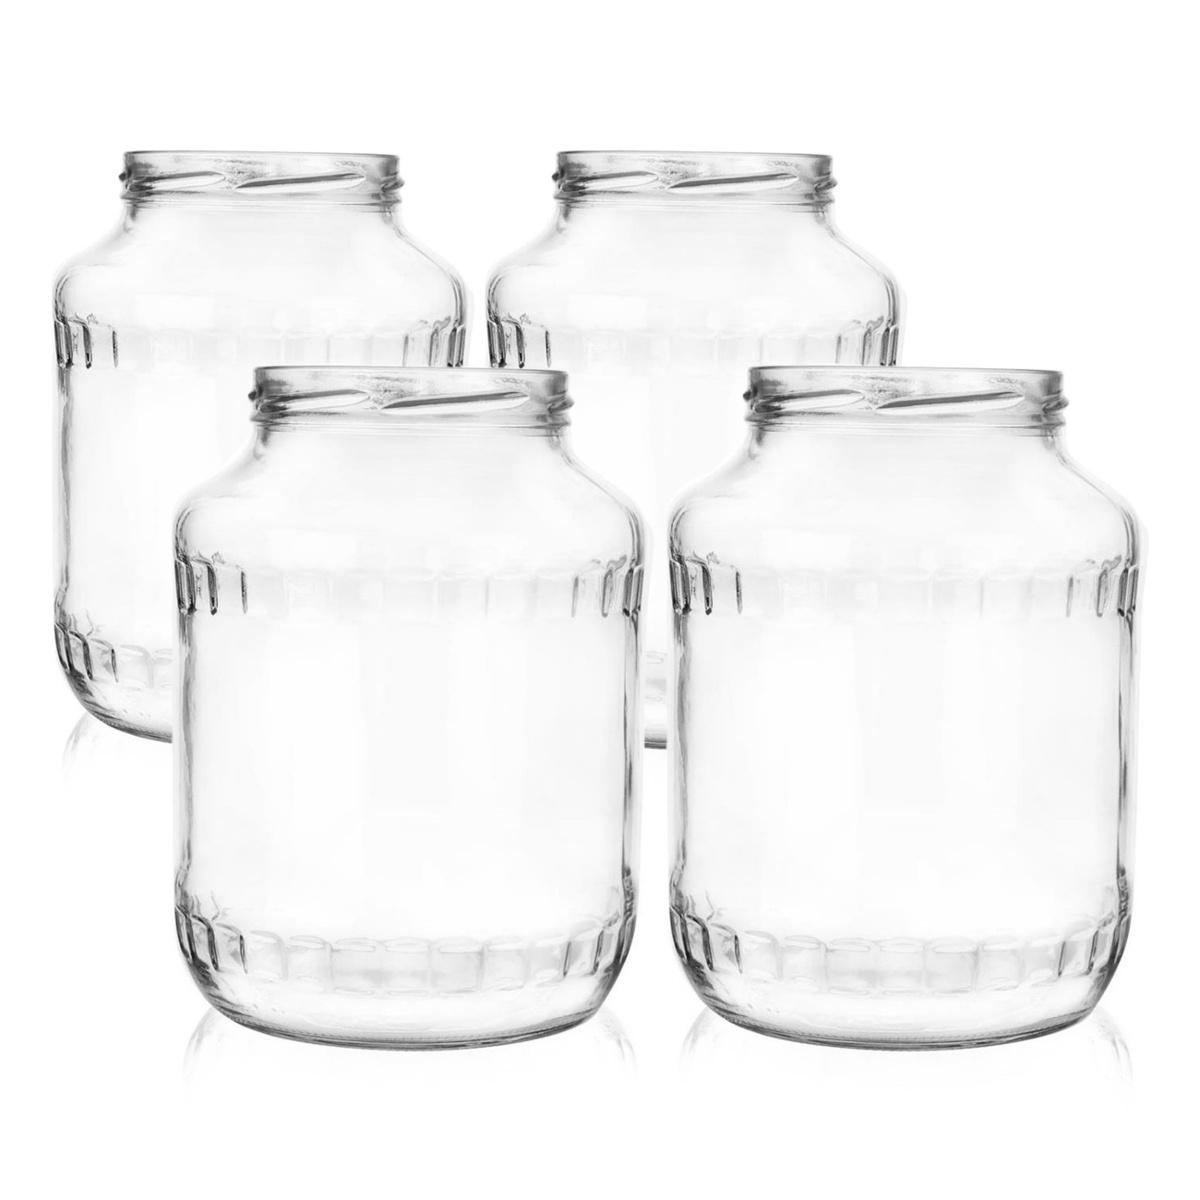 Orion Sada zaváracích pohárov Facetta 1,7 l, 4 ks